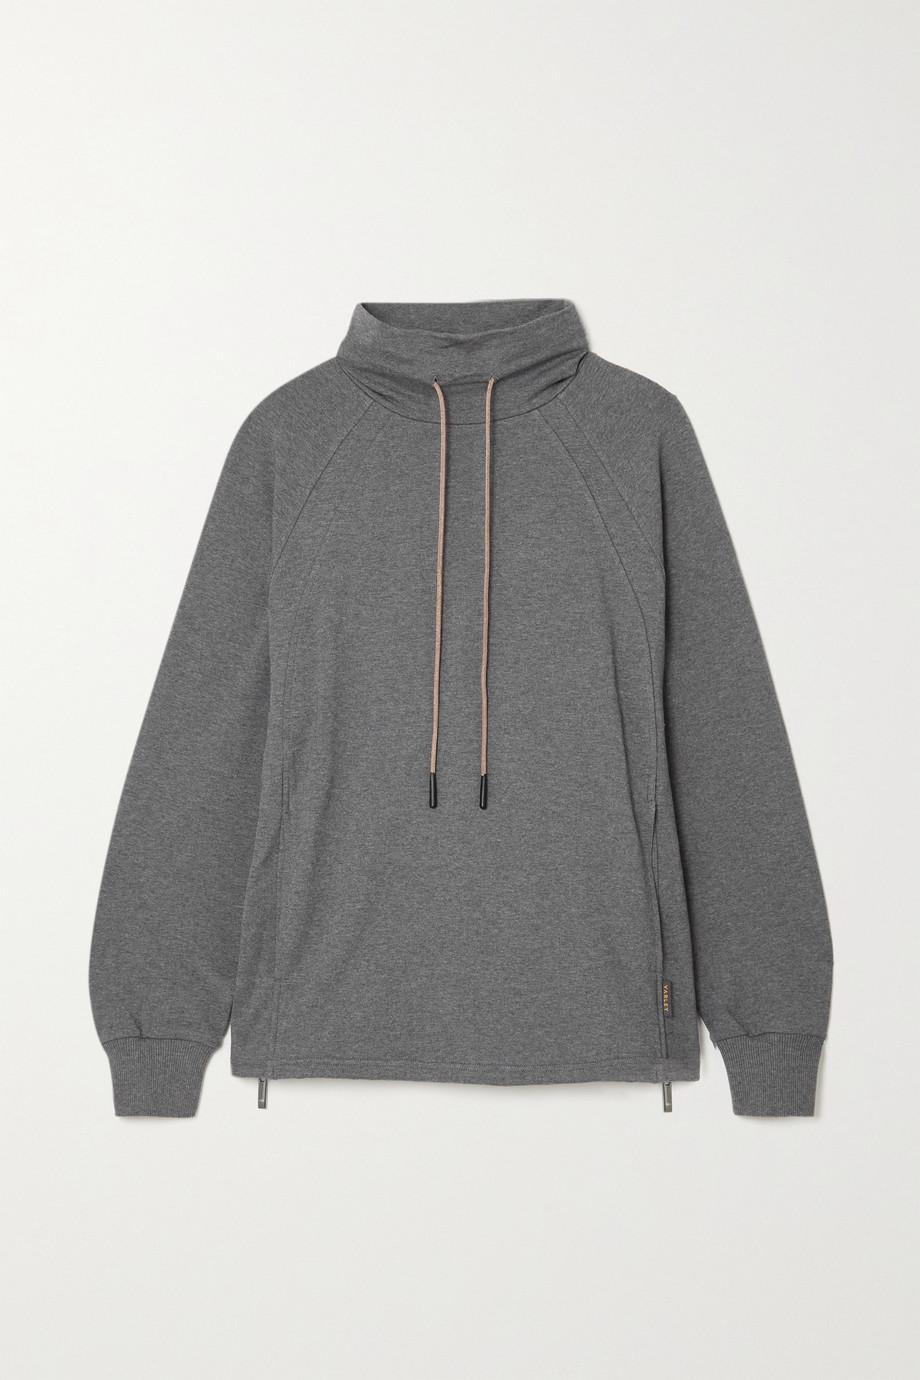 Varley Atlas zip-detailed mélange cotton-blend jersey sweatshirt